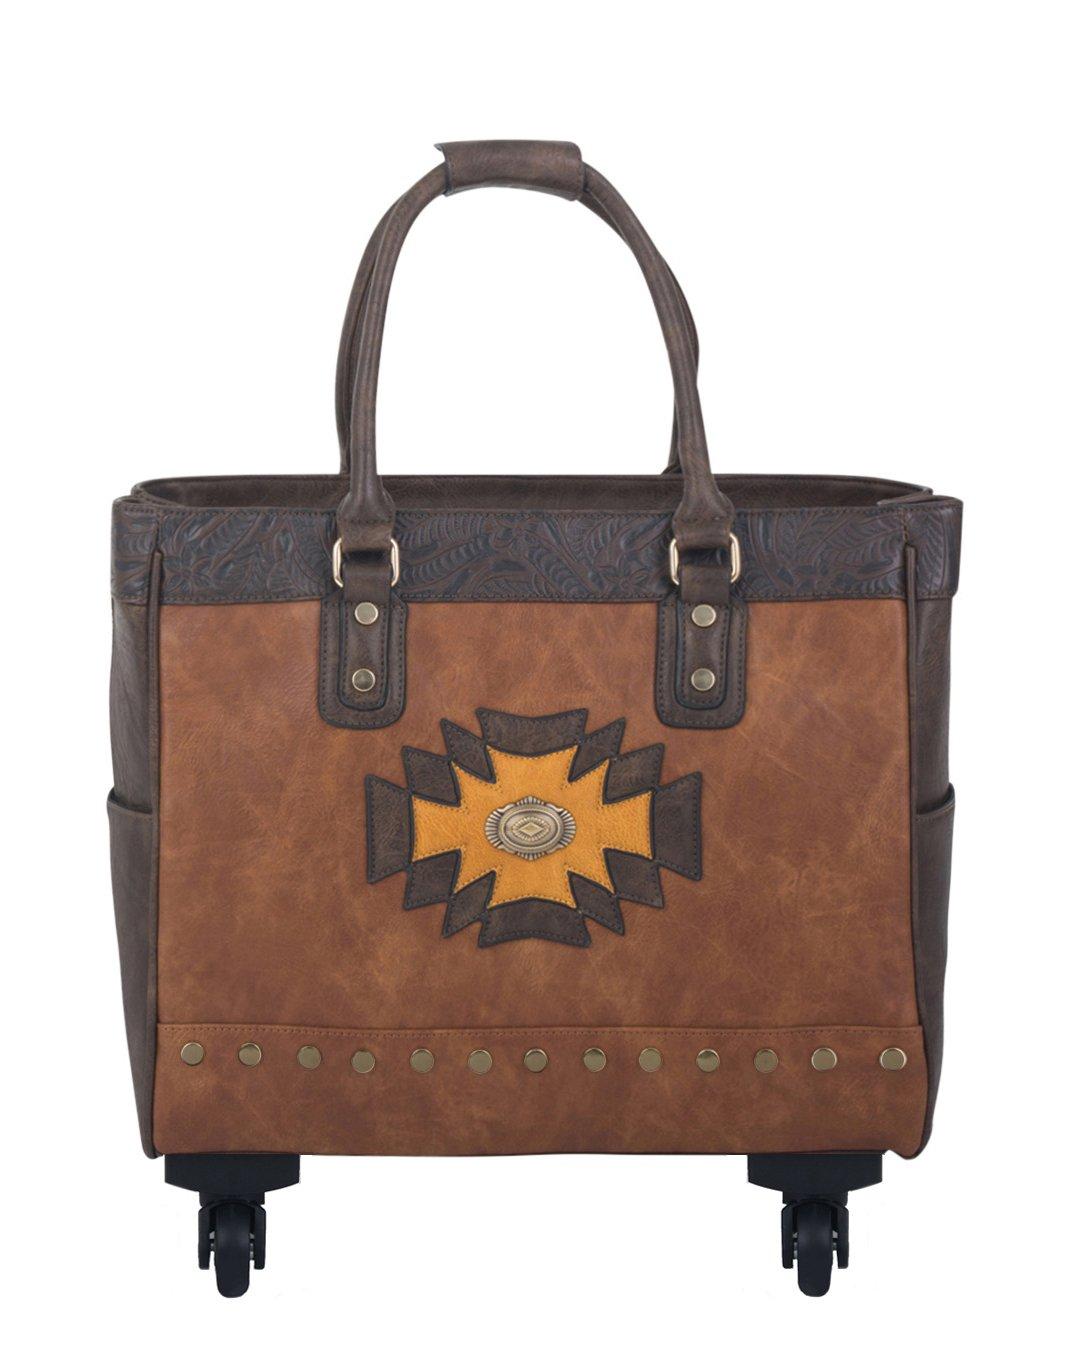 THE SANTA FE Brown Spinner Wheel Rolling iPad Tablet or Laptop Tote Carryall Bag